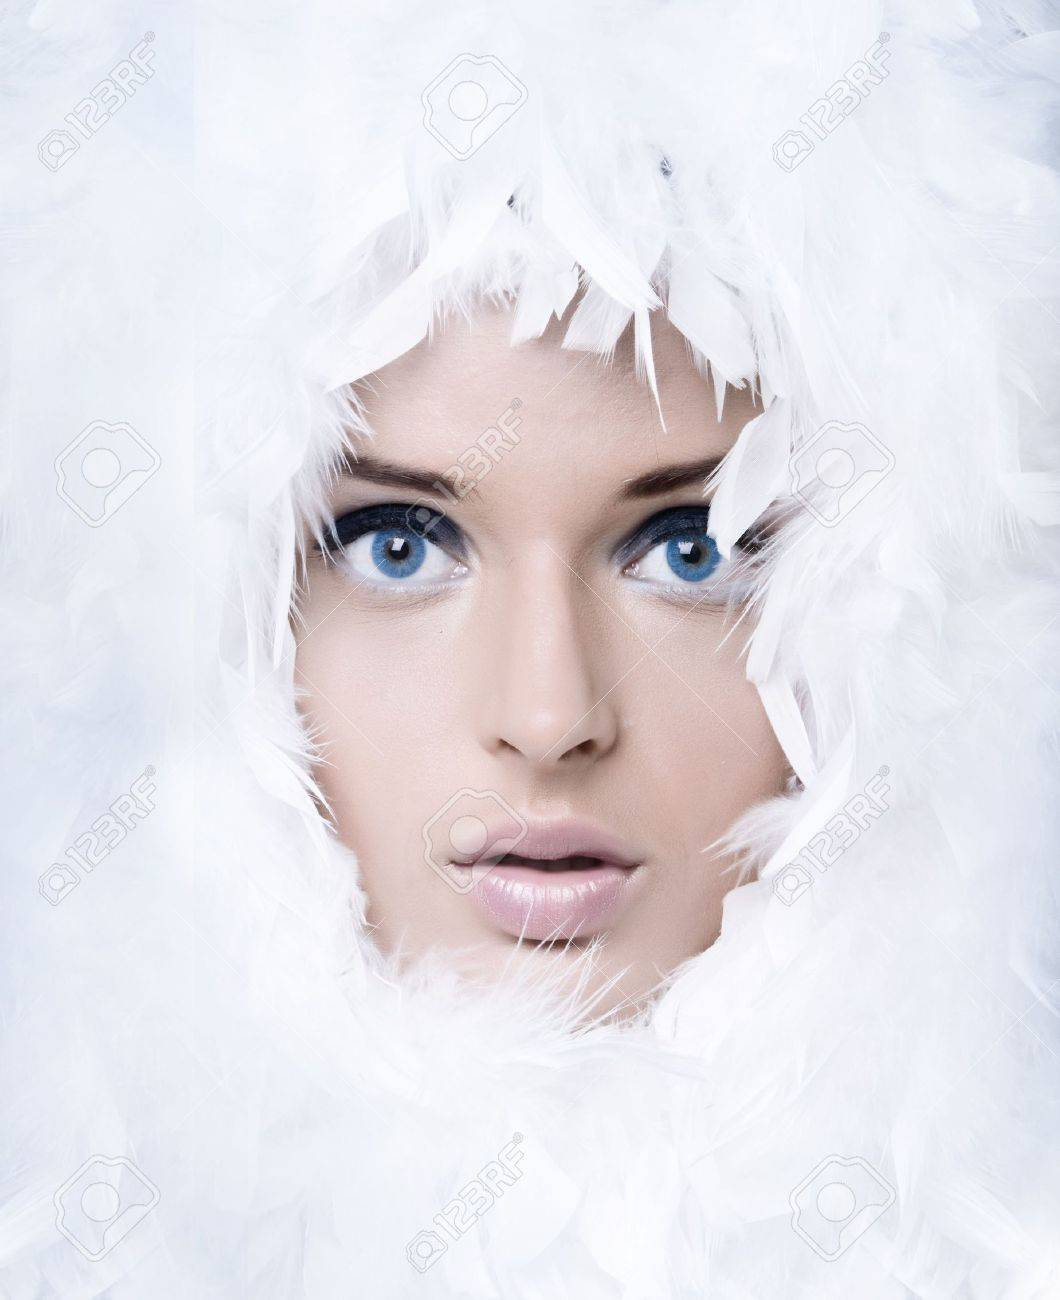 Closeup portrait of beautiful girl witk white feathers - 7873237